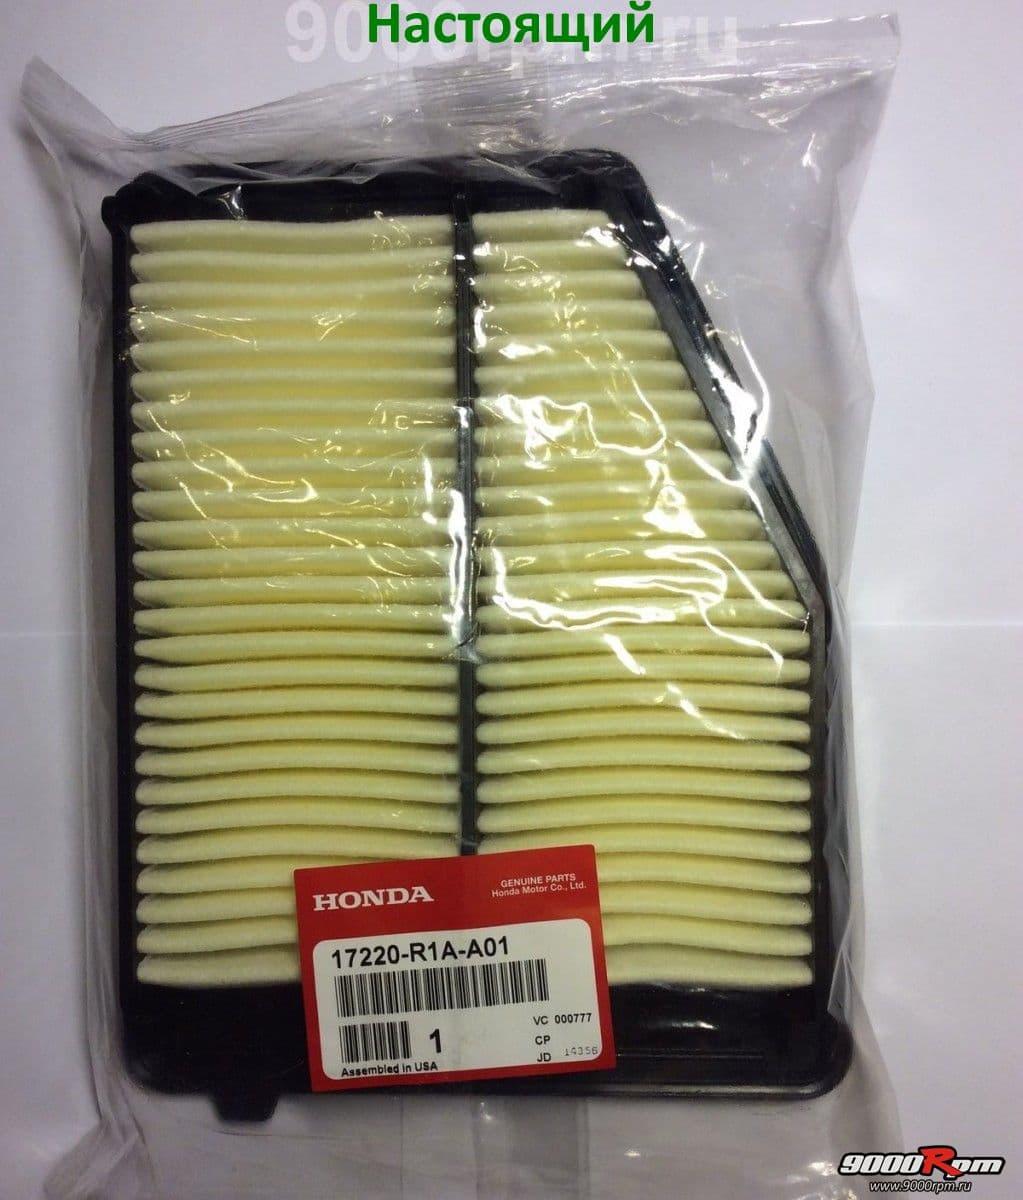 Автосервис Хонда 9000RpM: Ремонт Хонда